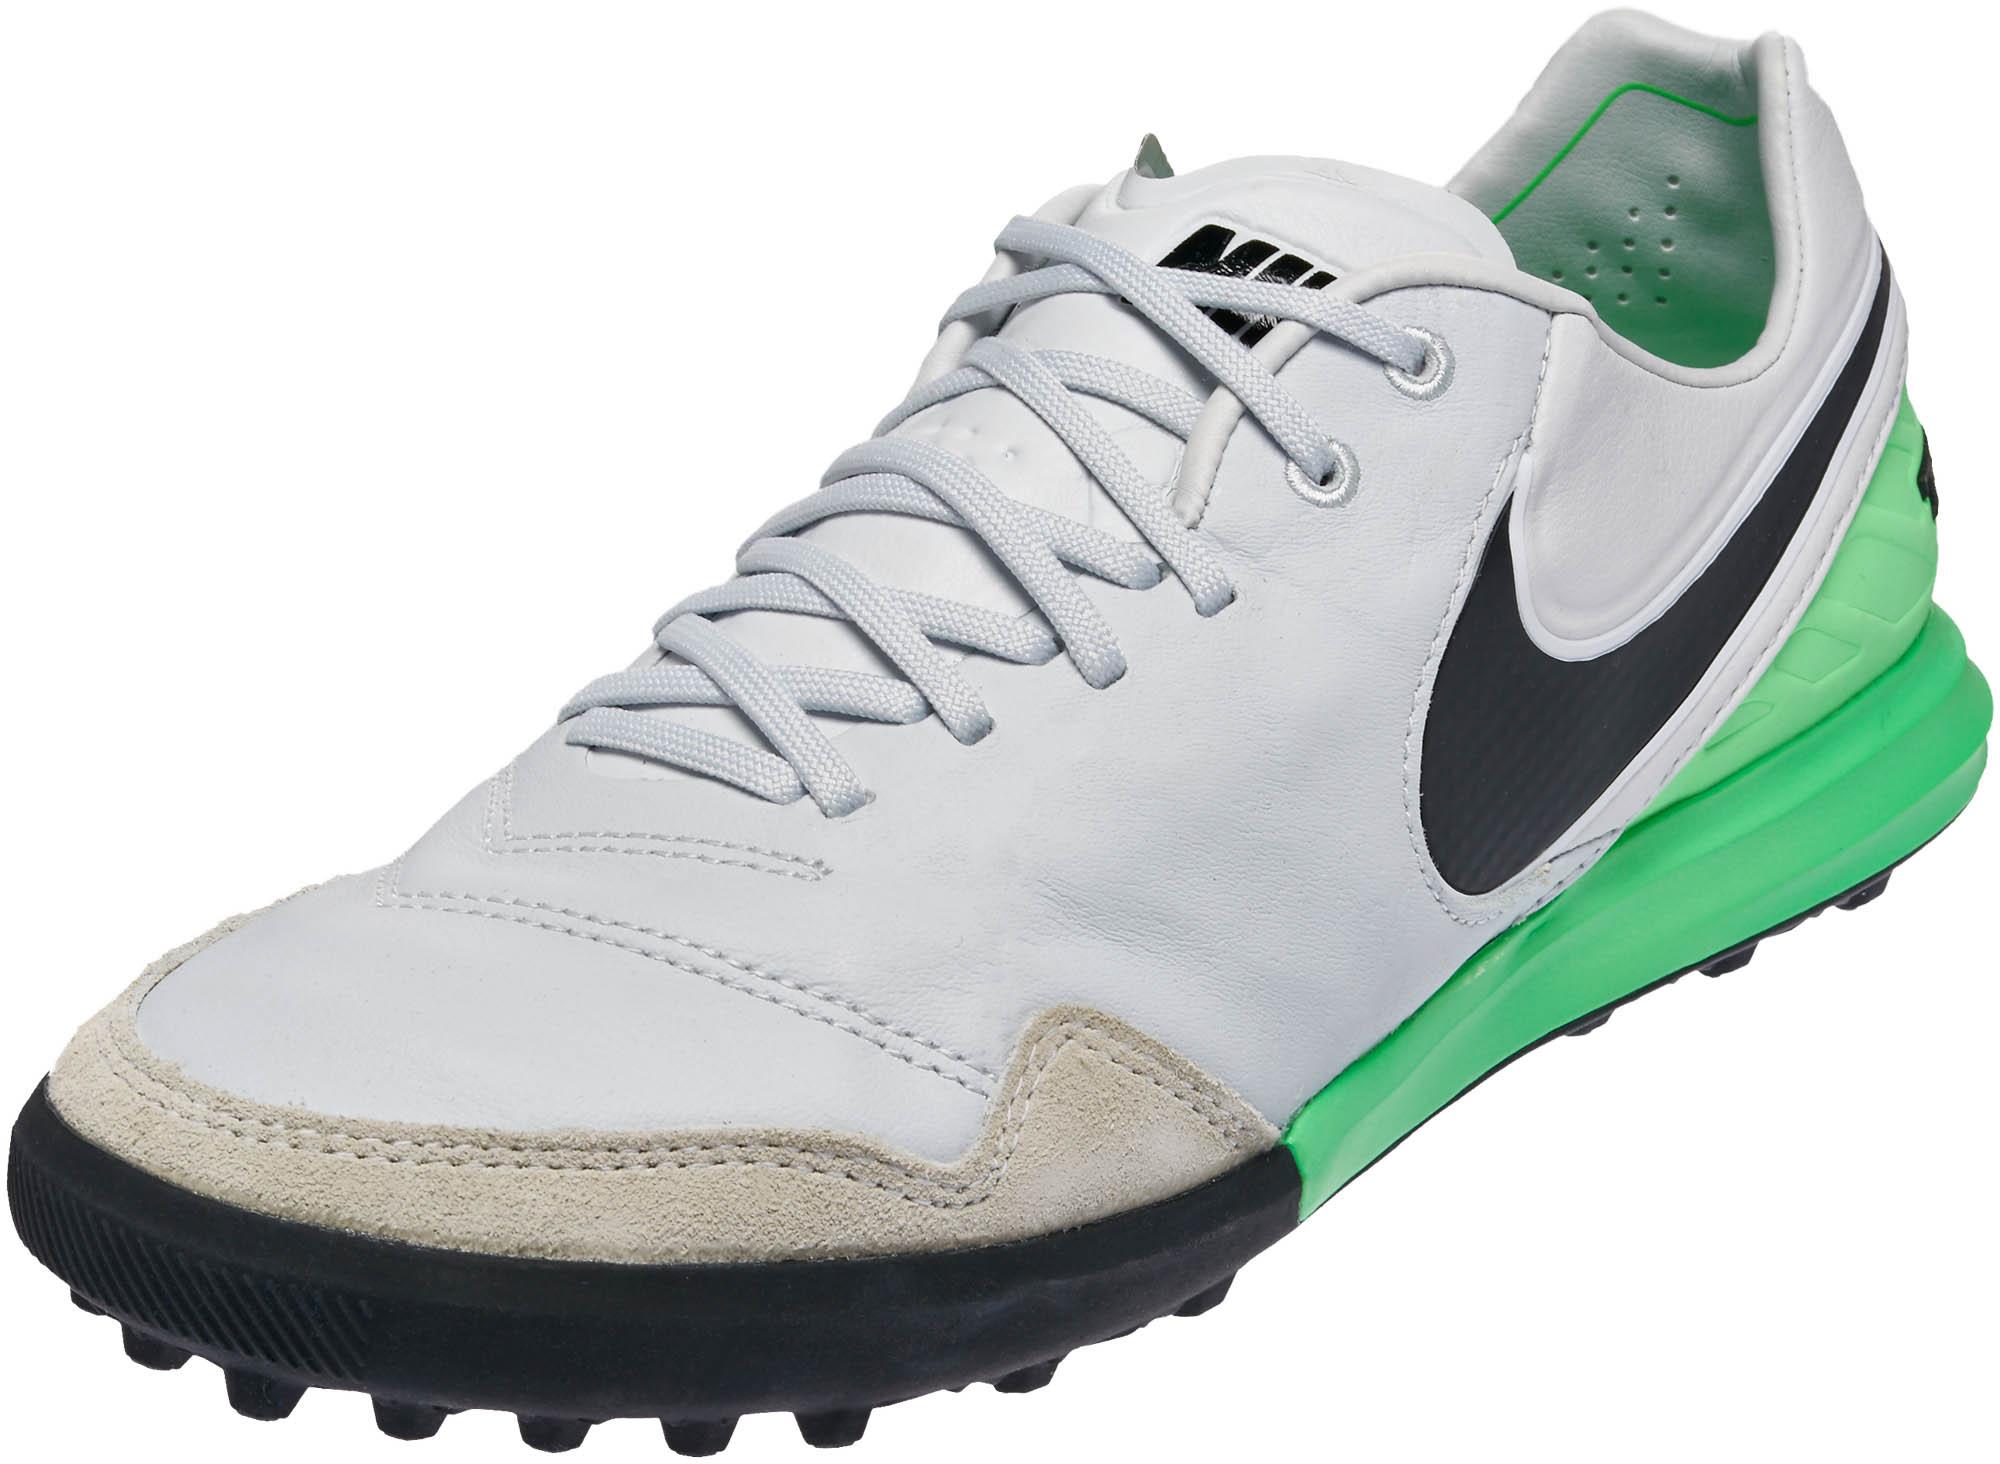 f59ead191e4a Nike TiempoX Proximo TF Soccer Shoes - Nike SCCRX Shoes